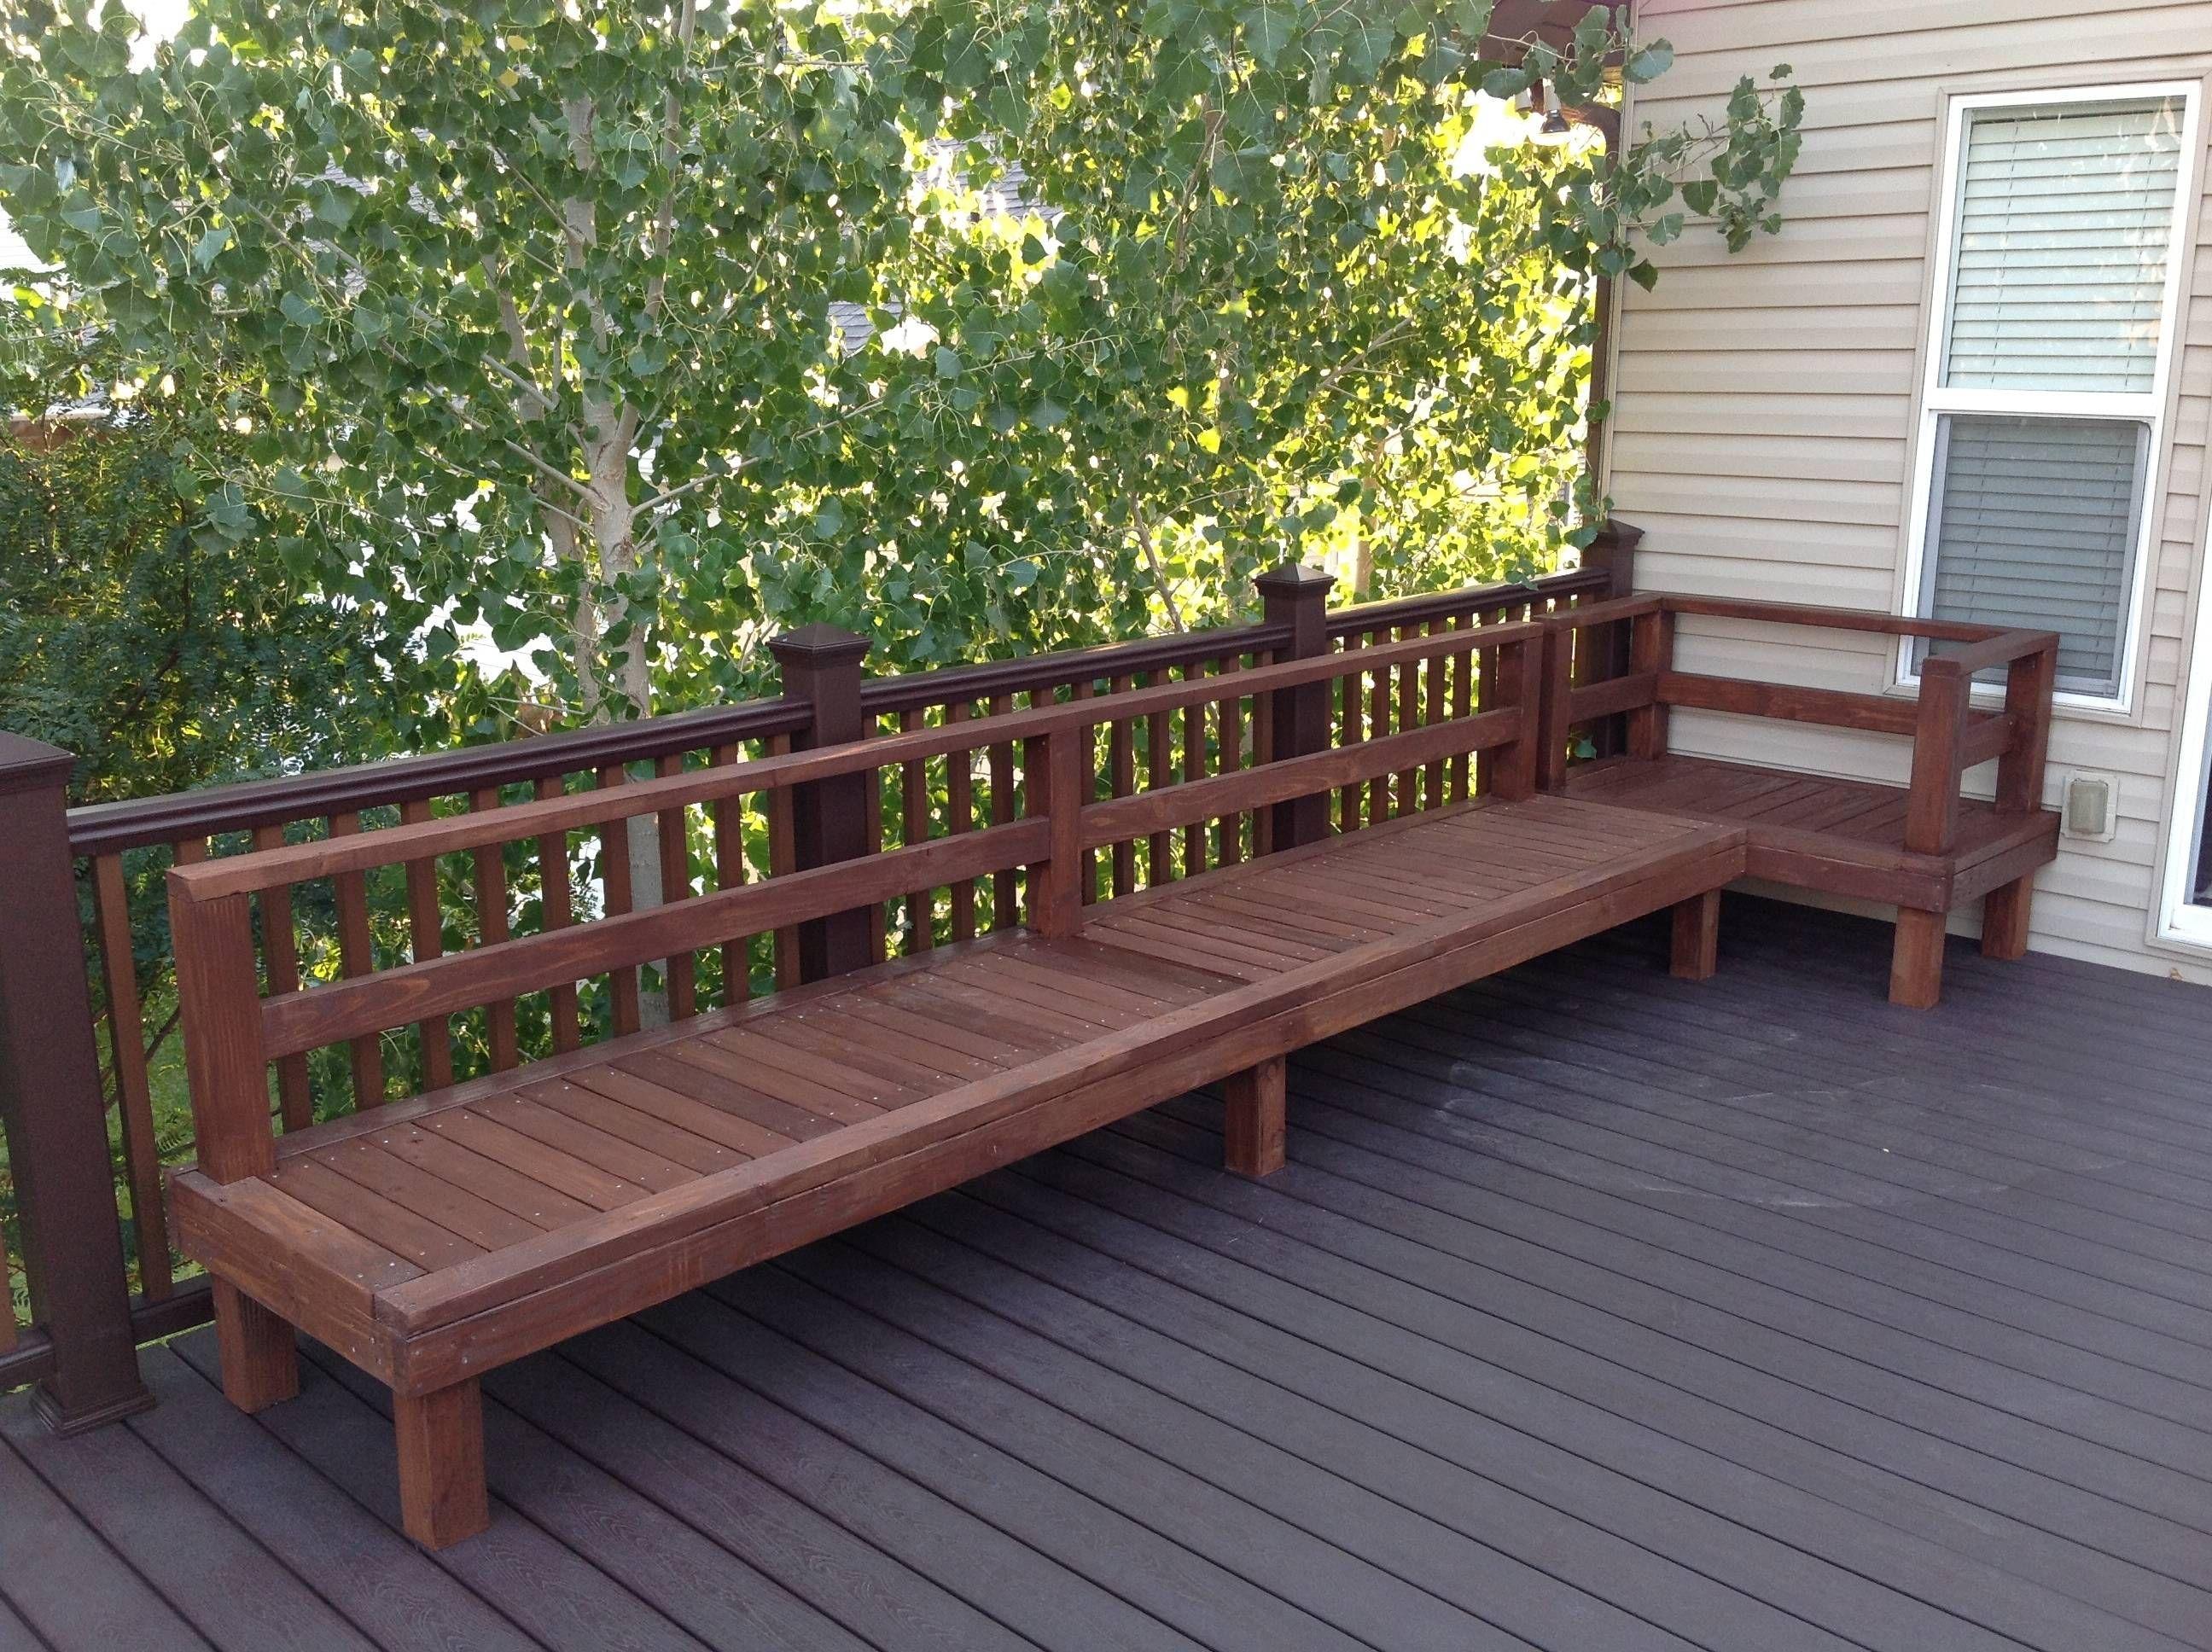 Diy Deck Furniture Diy Deck Furniture Diy Deck Outdoor